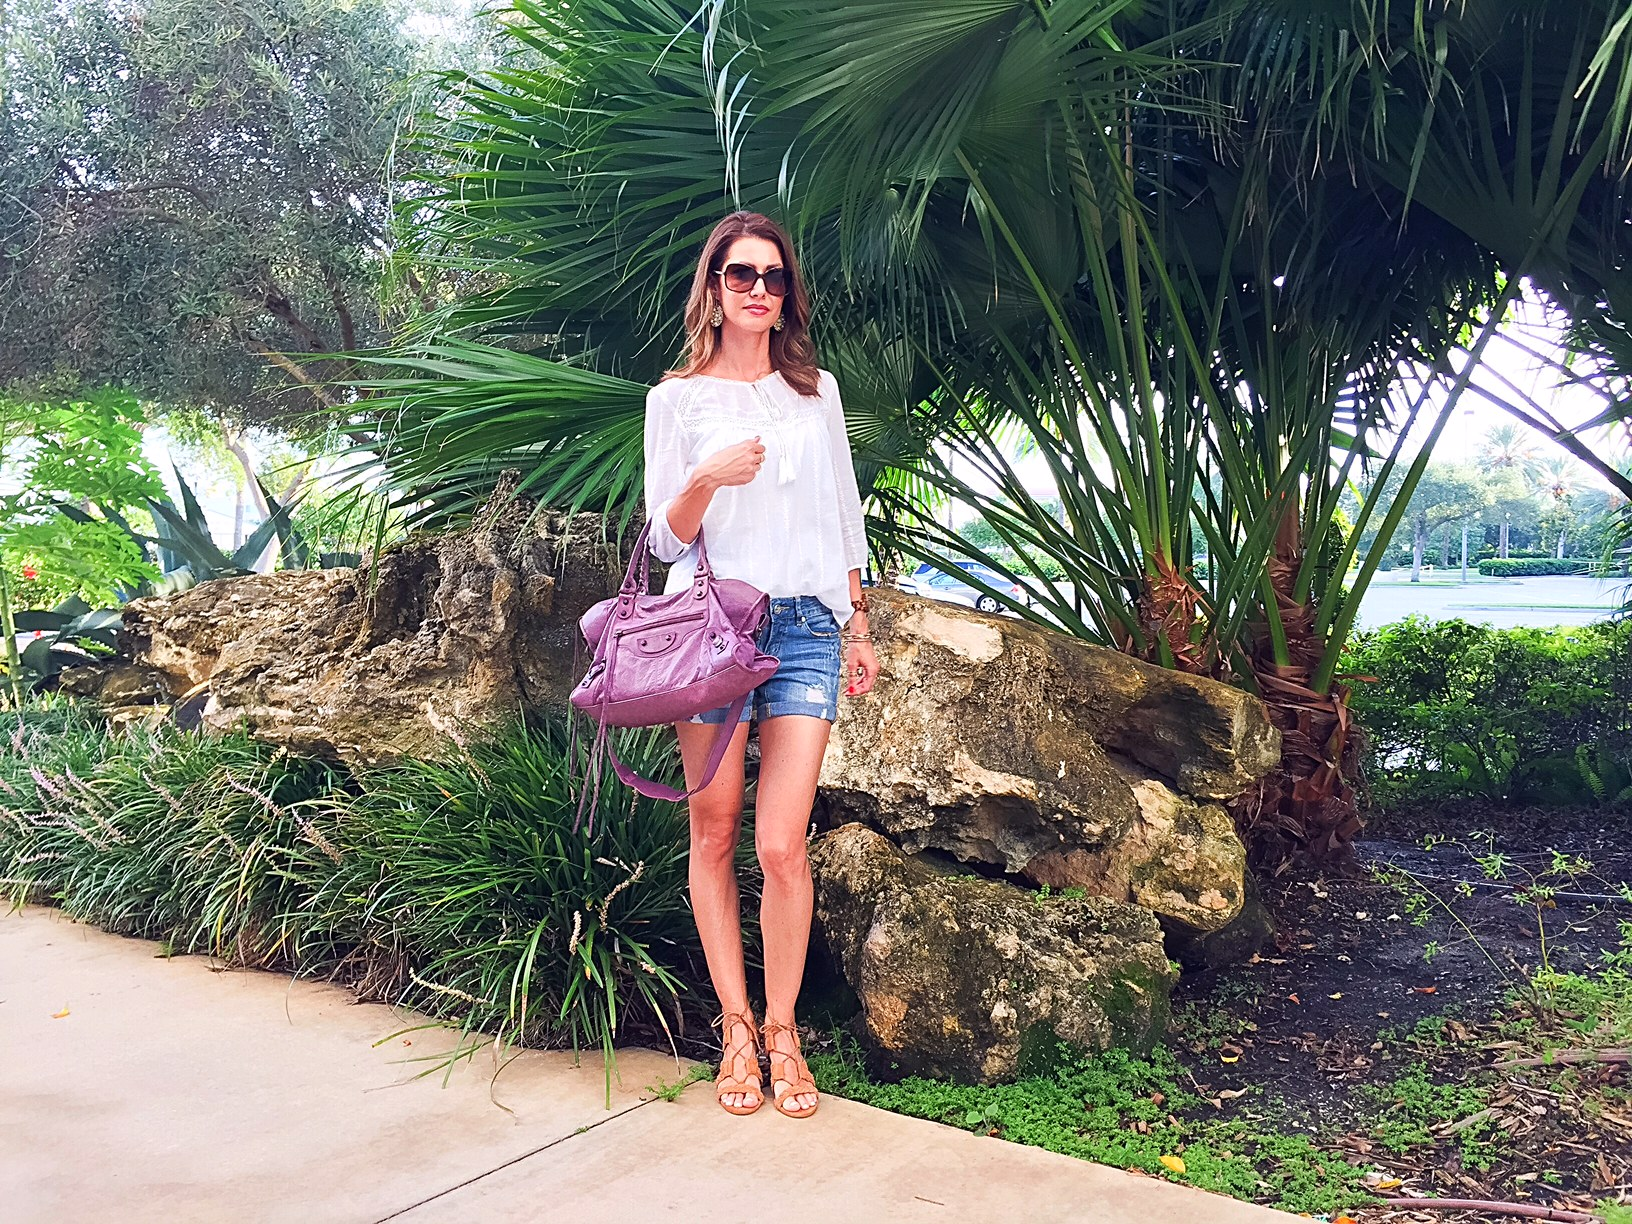 b1ad8750da Balenciaga City Bag Review  How to Make a Timeless Style Statement ...